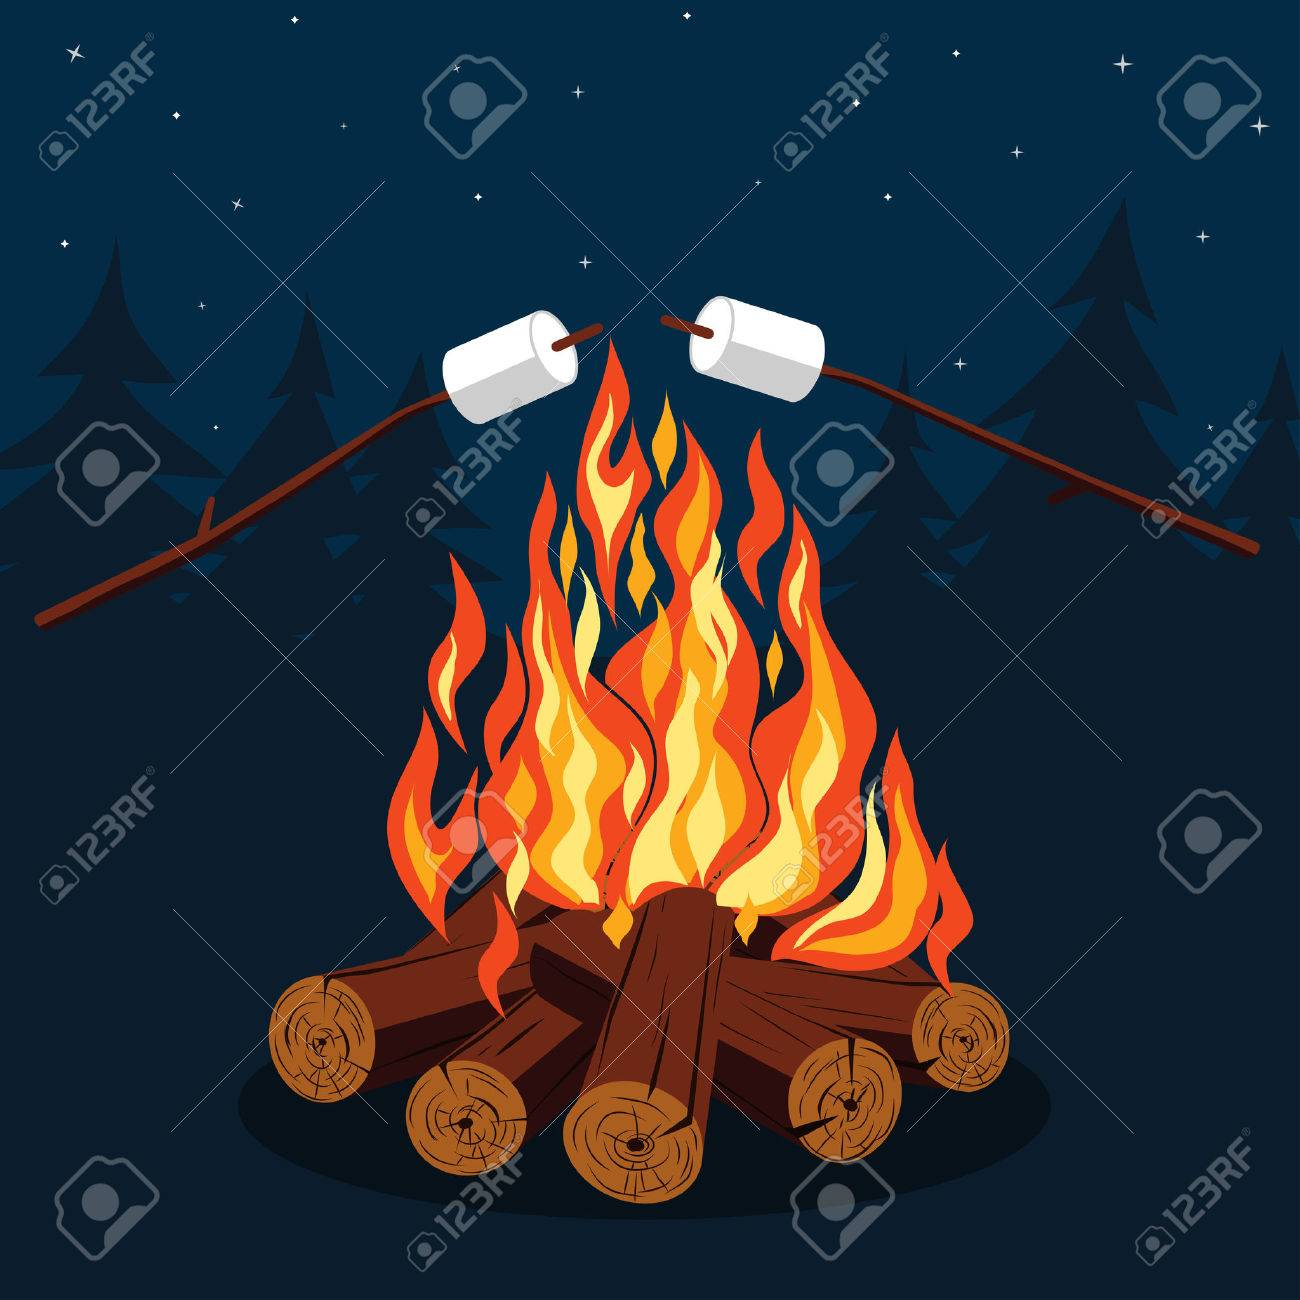 Bonfire with marshmallow - camping, burning woodpile. - 50127839